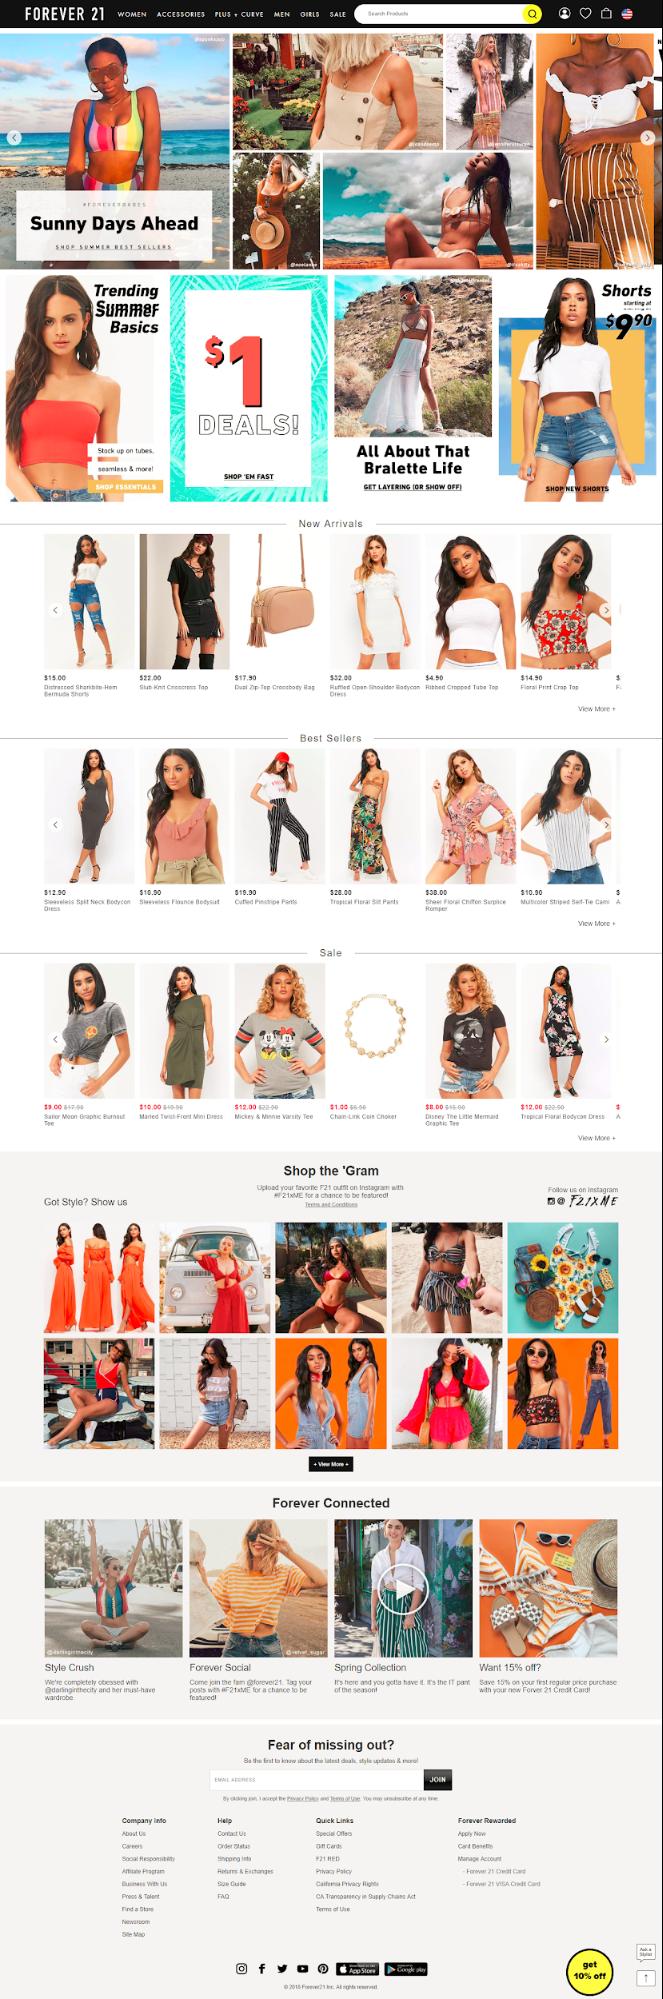 Screenshot showing an ecommerce store